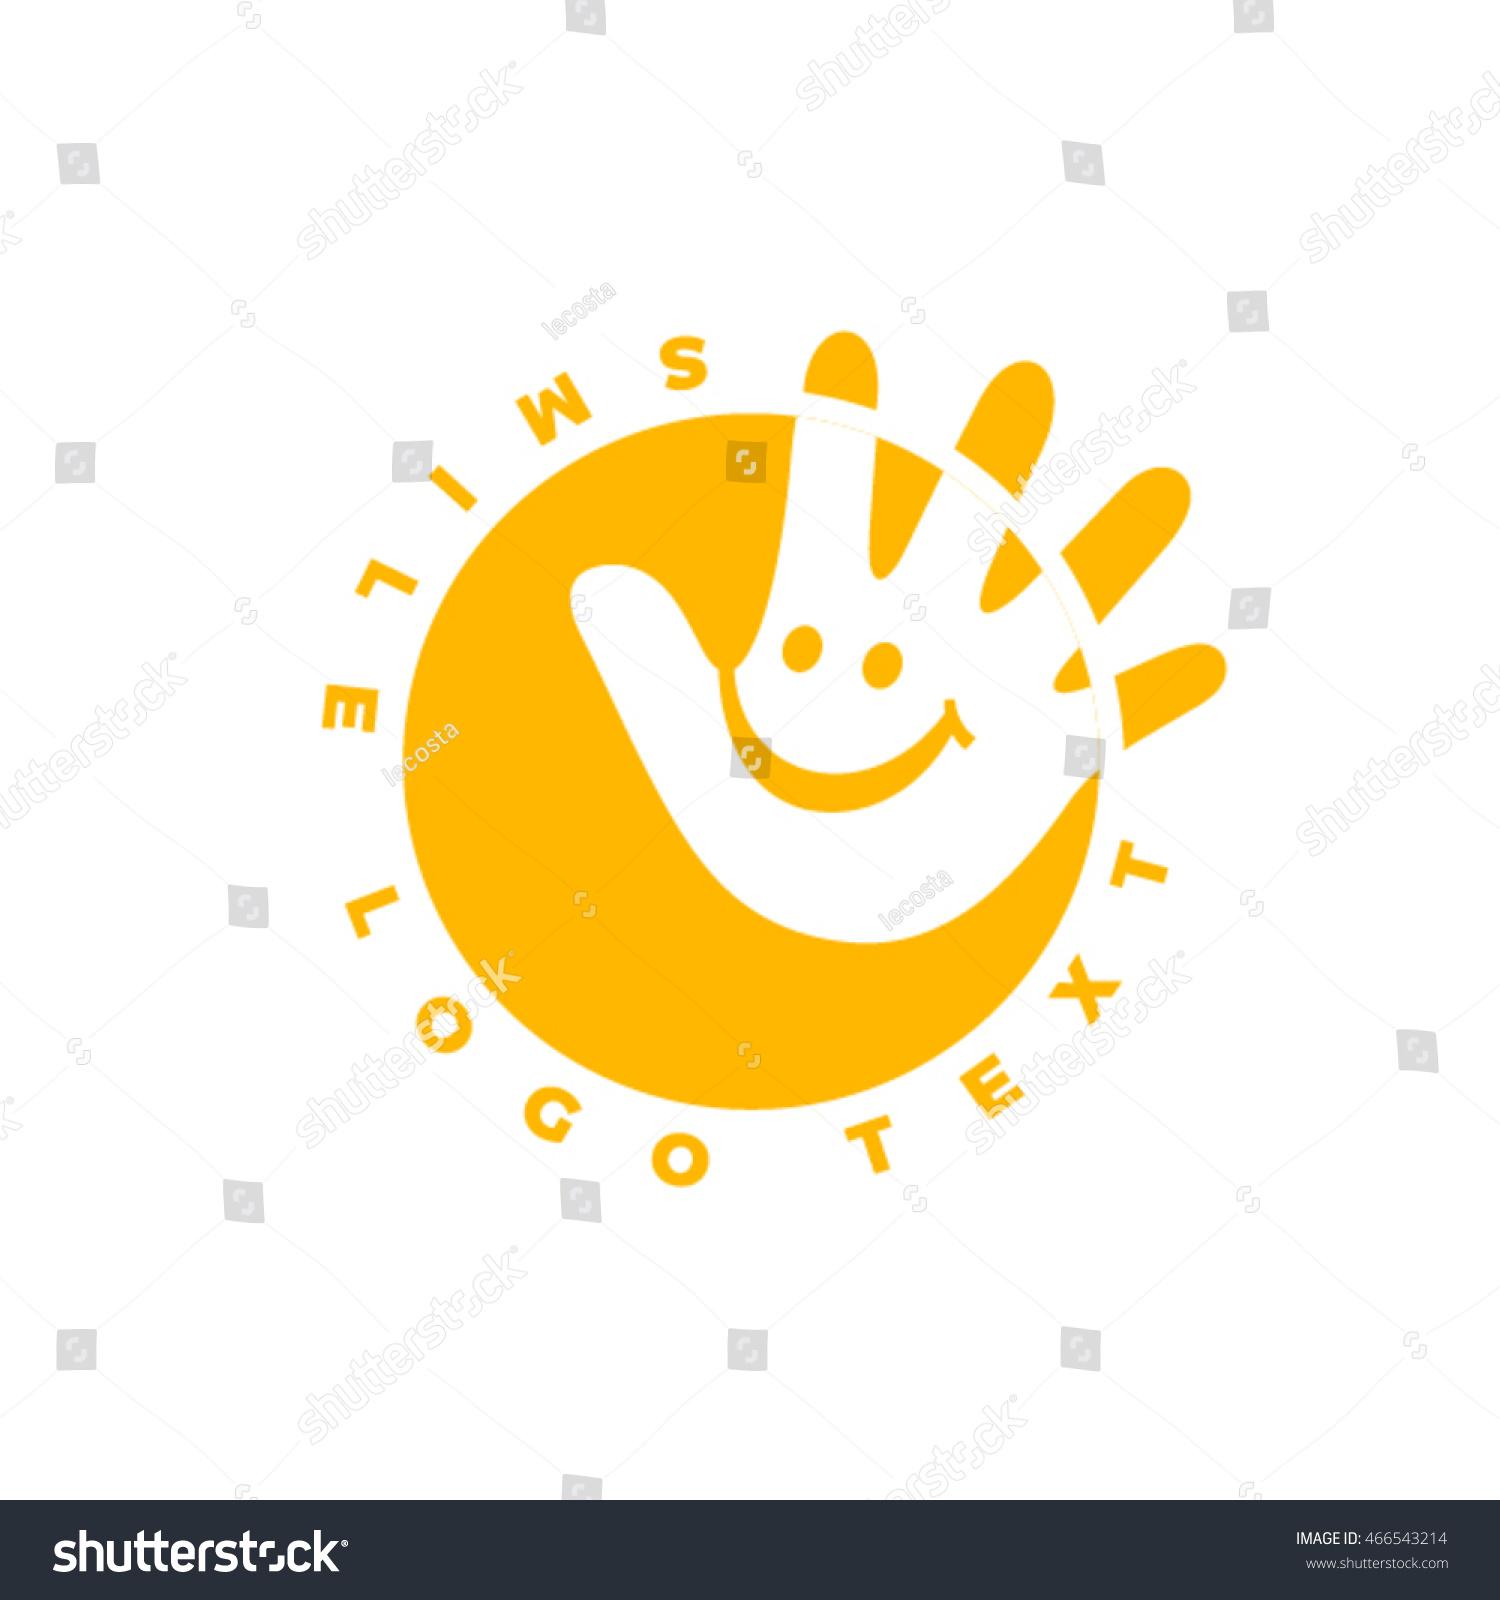 kinder garden logo design stock vector shutterstock